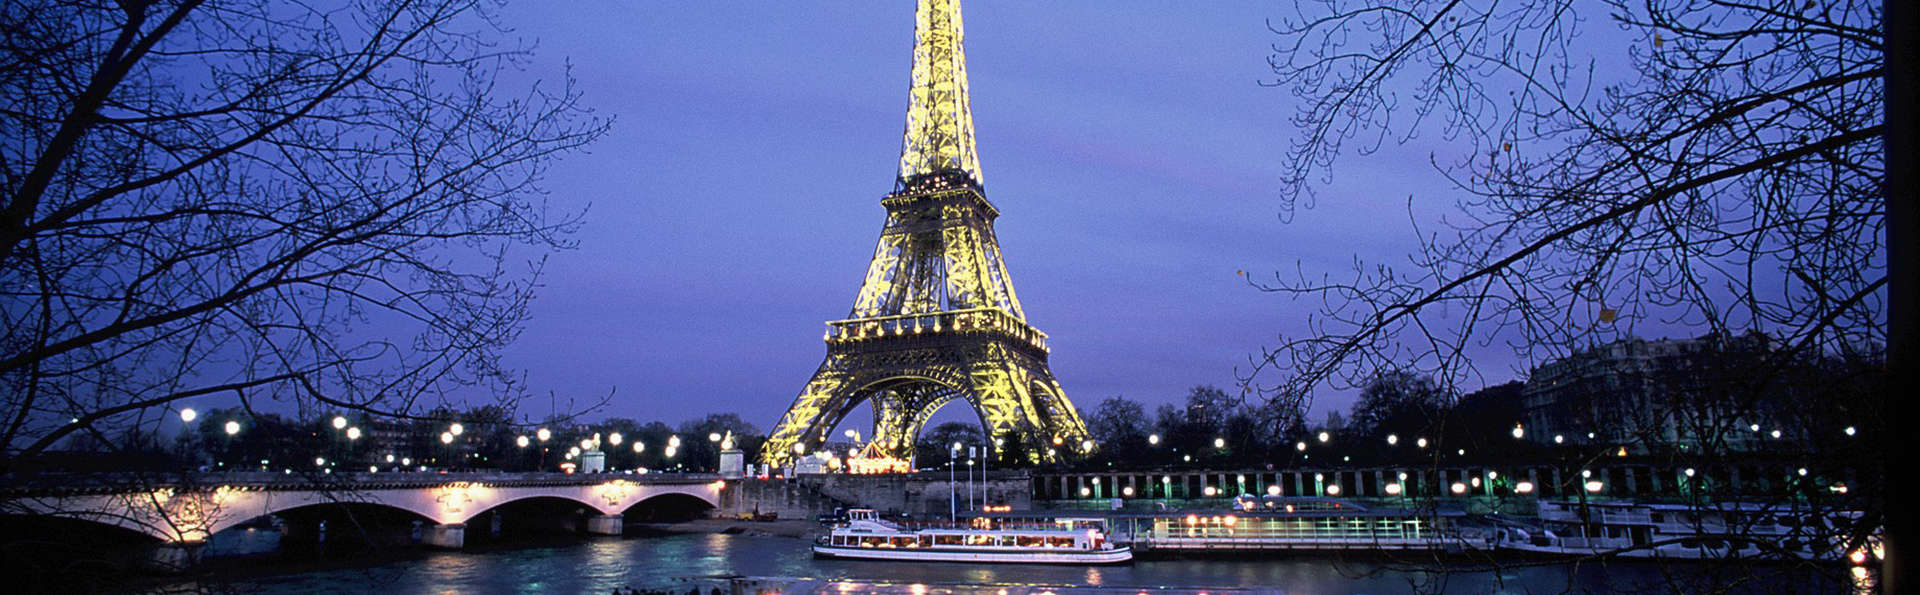 Hotel Basss - Montmartre - EDIT_destination1.jpg